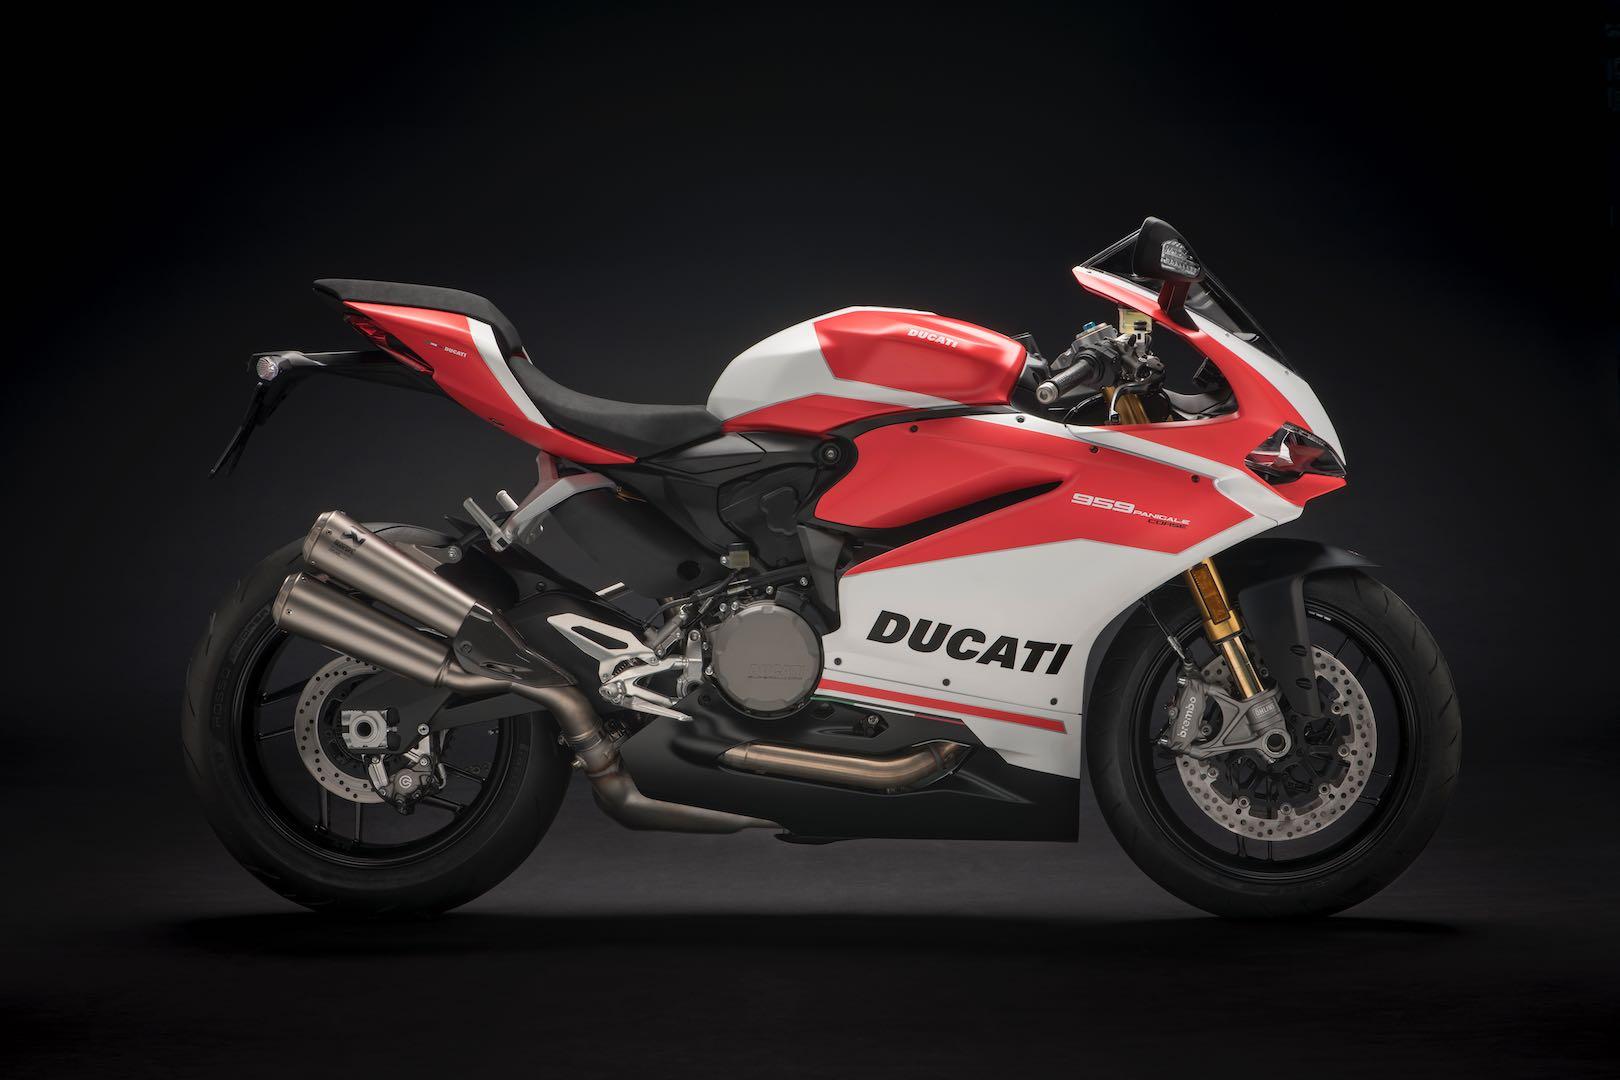 2018 Ducati 959 Panigale Corse horsepower